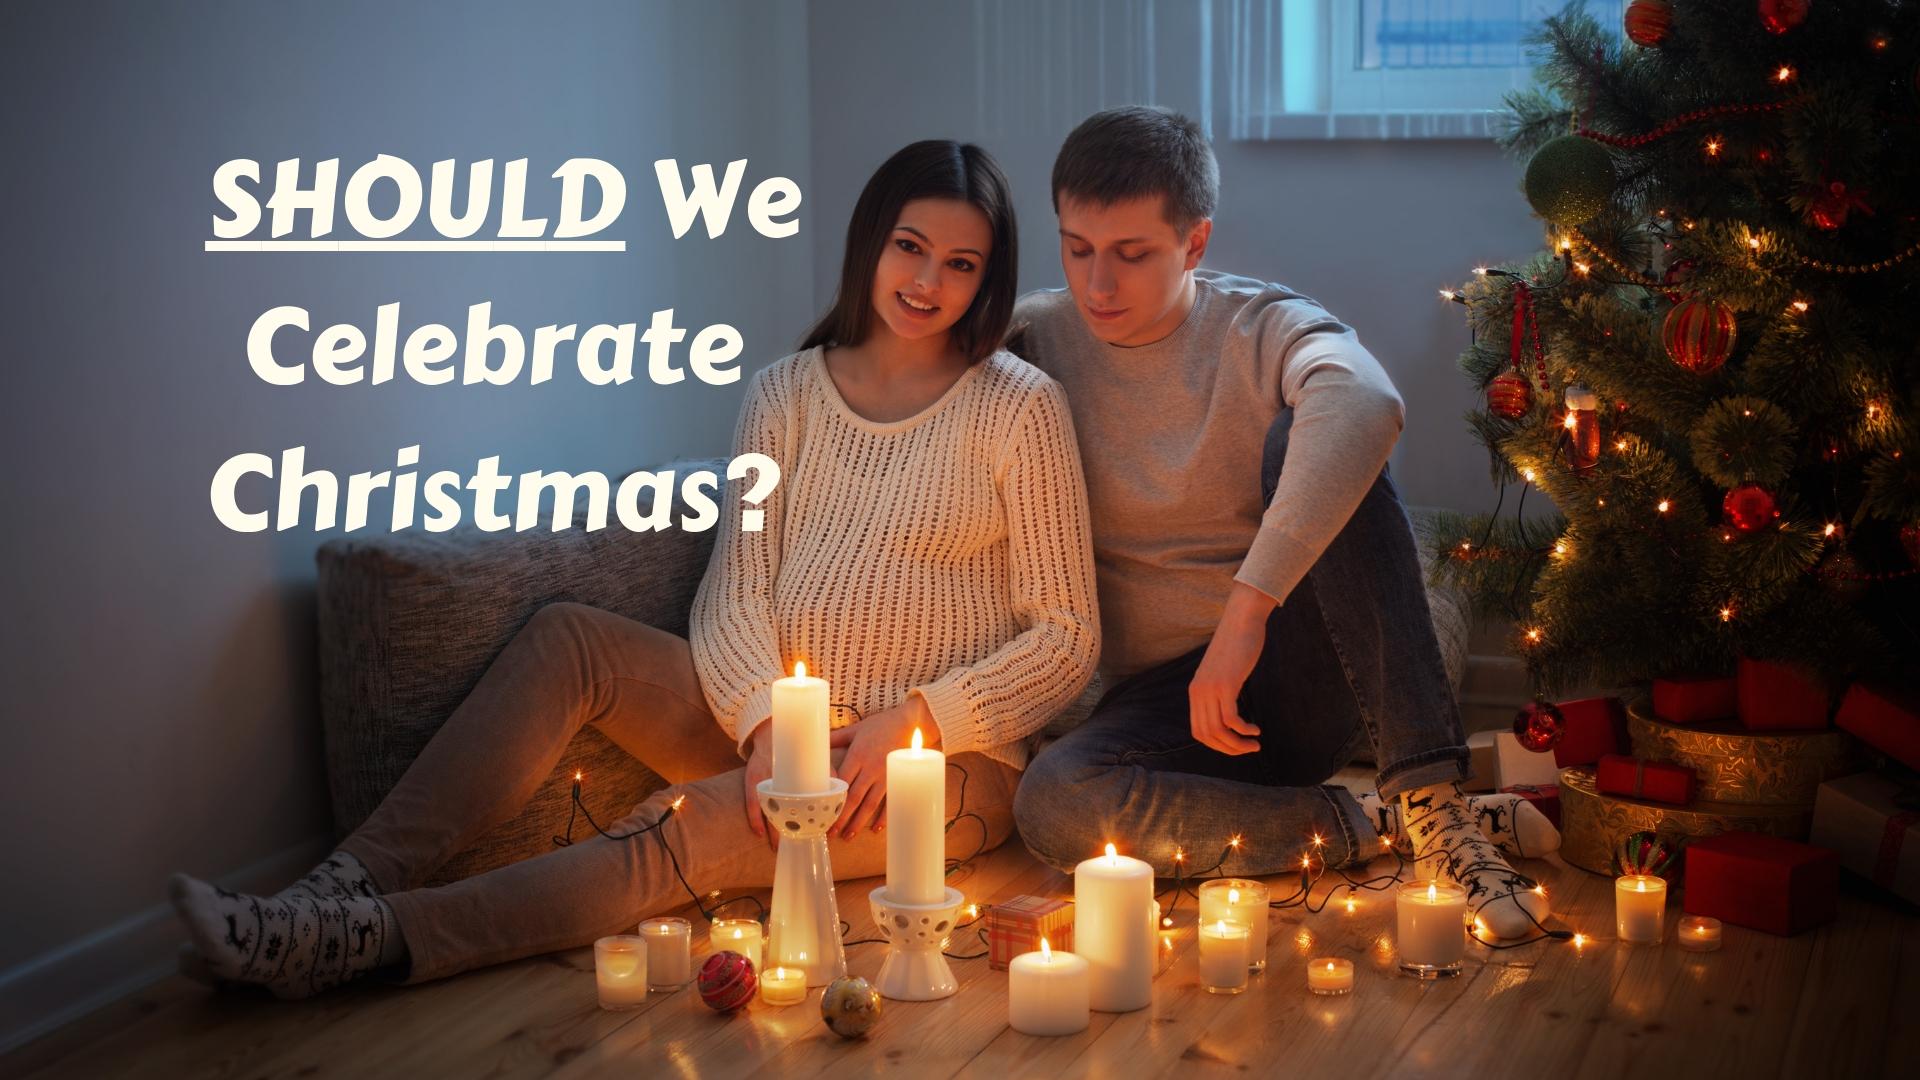 Christians Celebrate Christmas? Adobe Stock - Canva